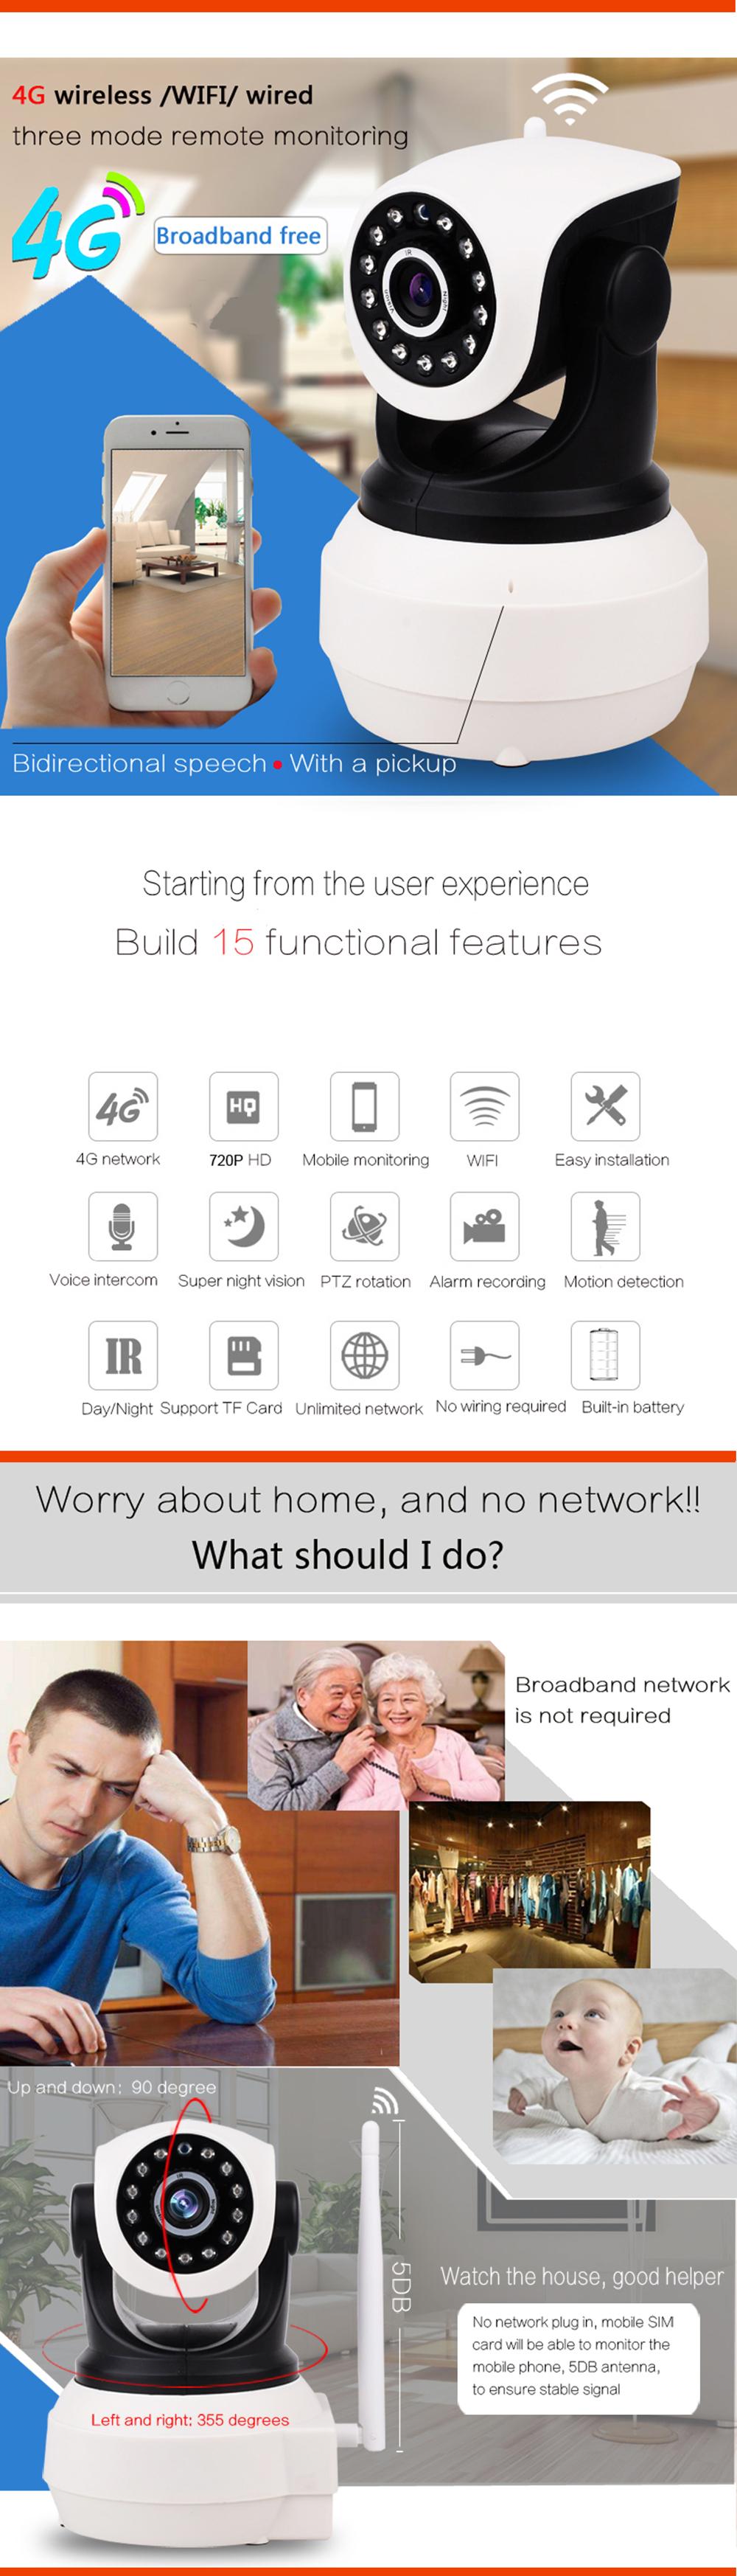 Wifi Camera 4G 3G Sim Card 1080P HD Network Video Wireless IP Camera GSM Security Baby Surveillance  APP Control Baby Monitor